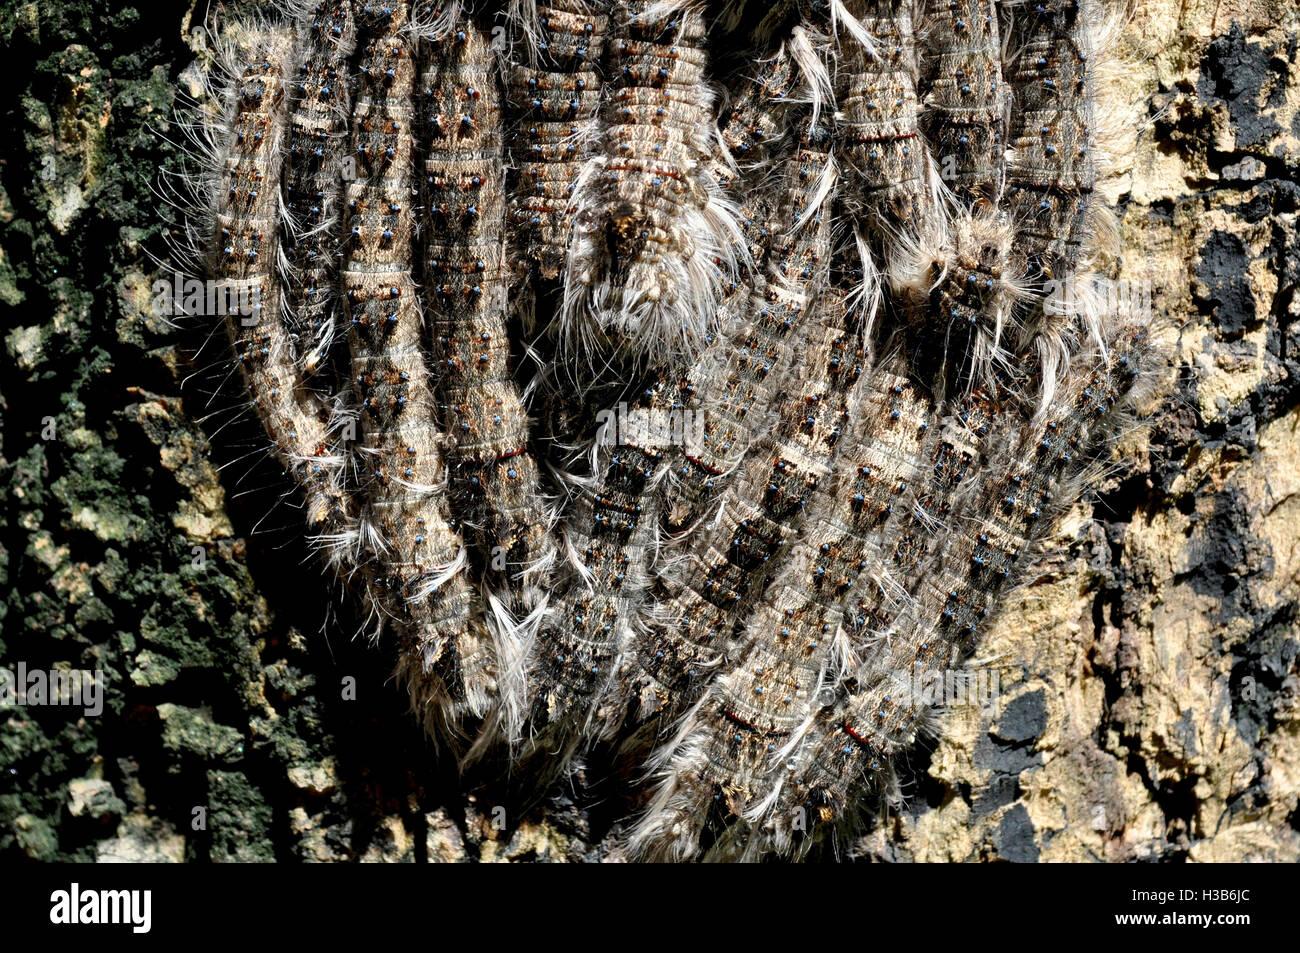 Noida, Uttar Pradesh, India- August 22, 2016: A group of hairy Caterpillars on a tree in a garden at Noida, Uttar Stock Photo